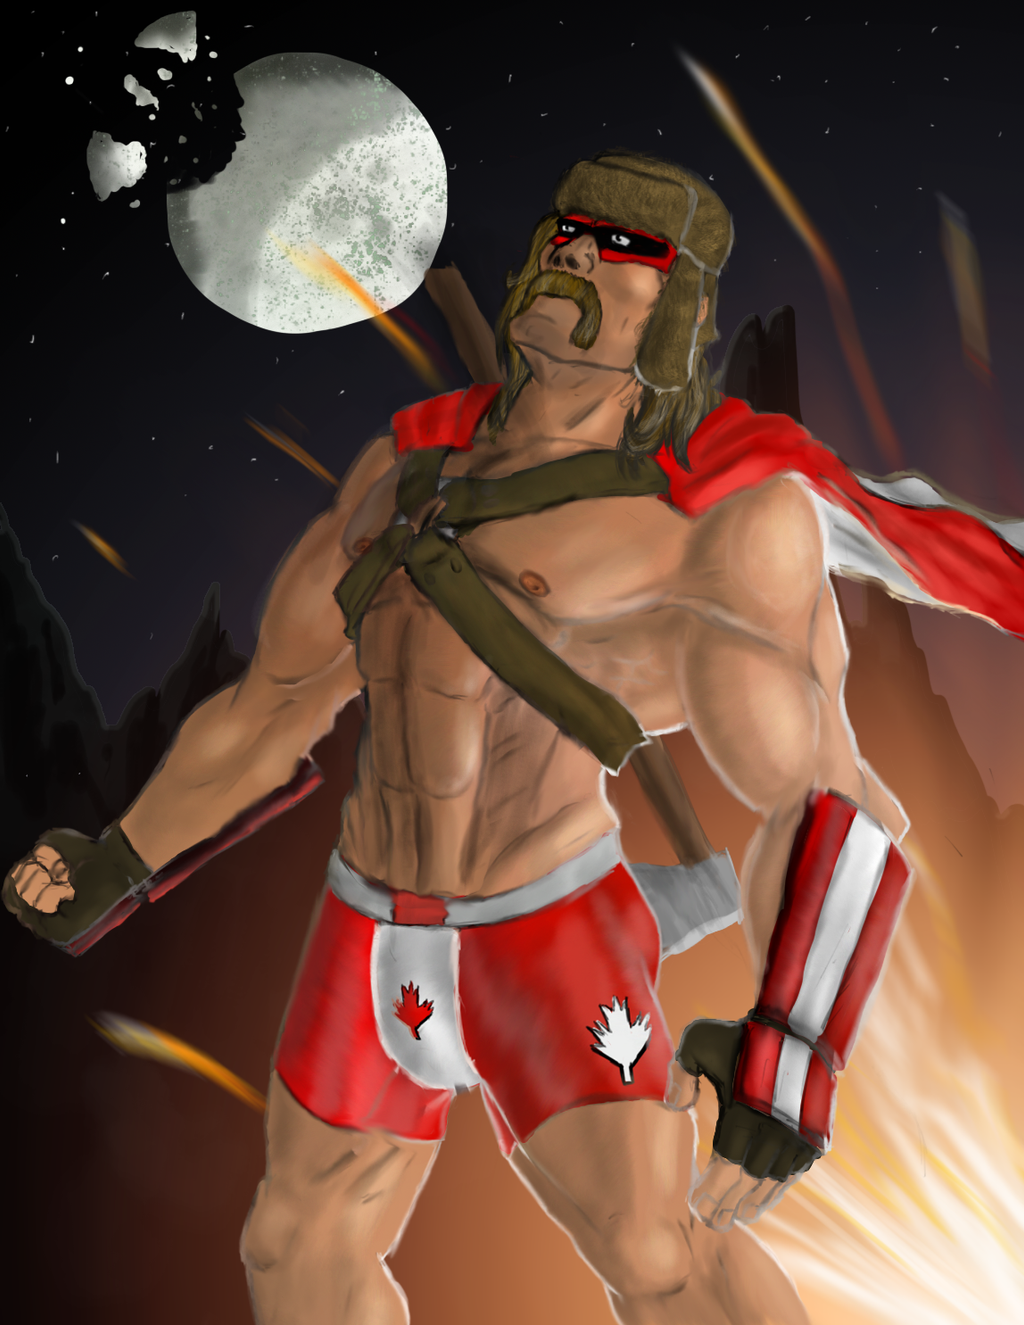 Commander Canada by Kopheay